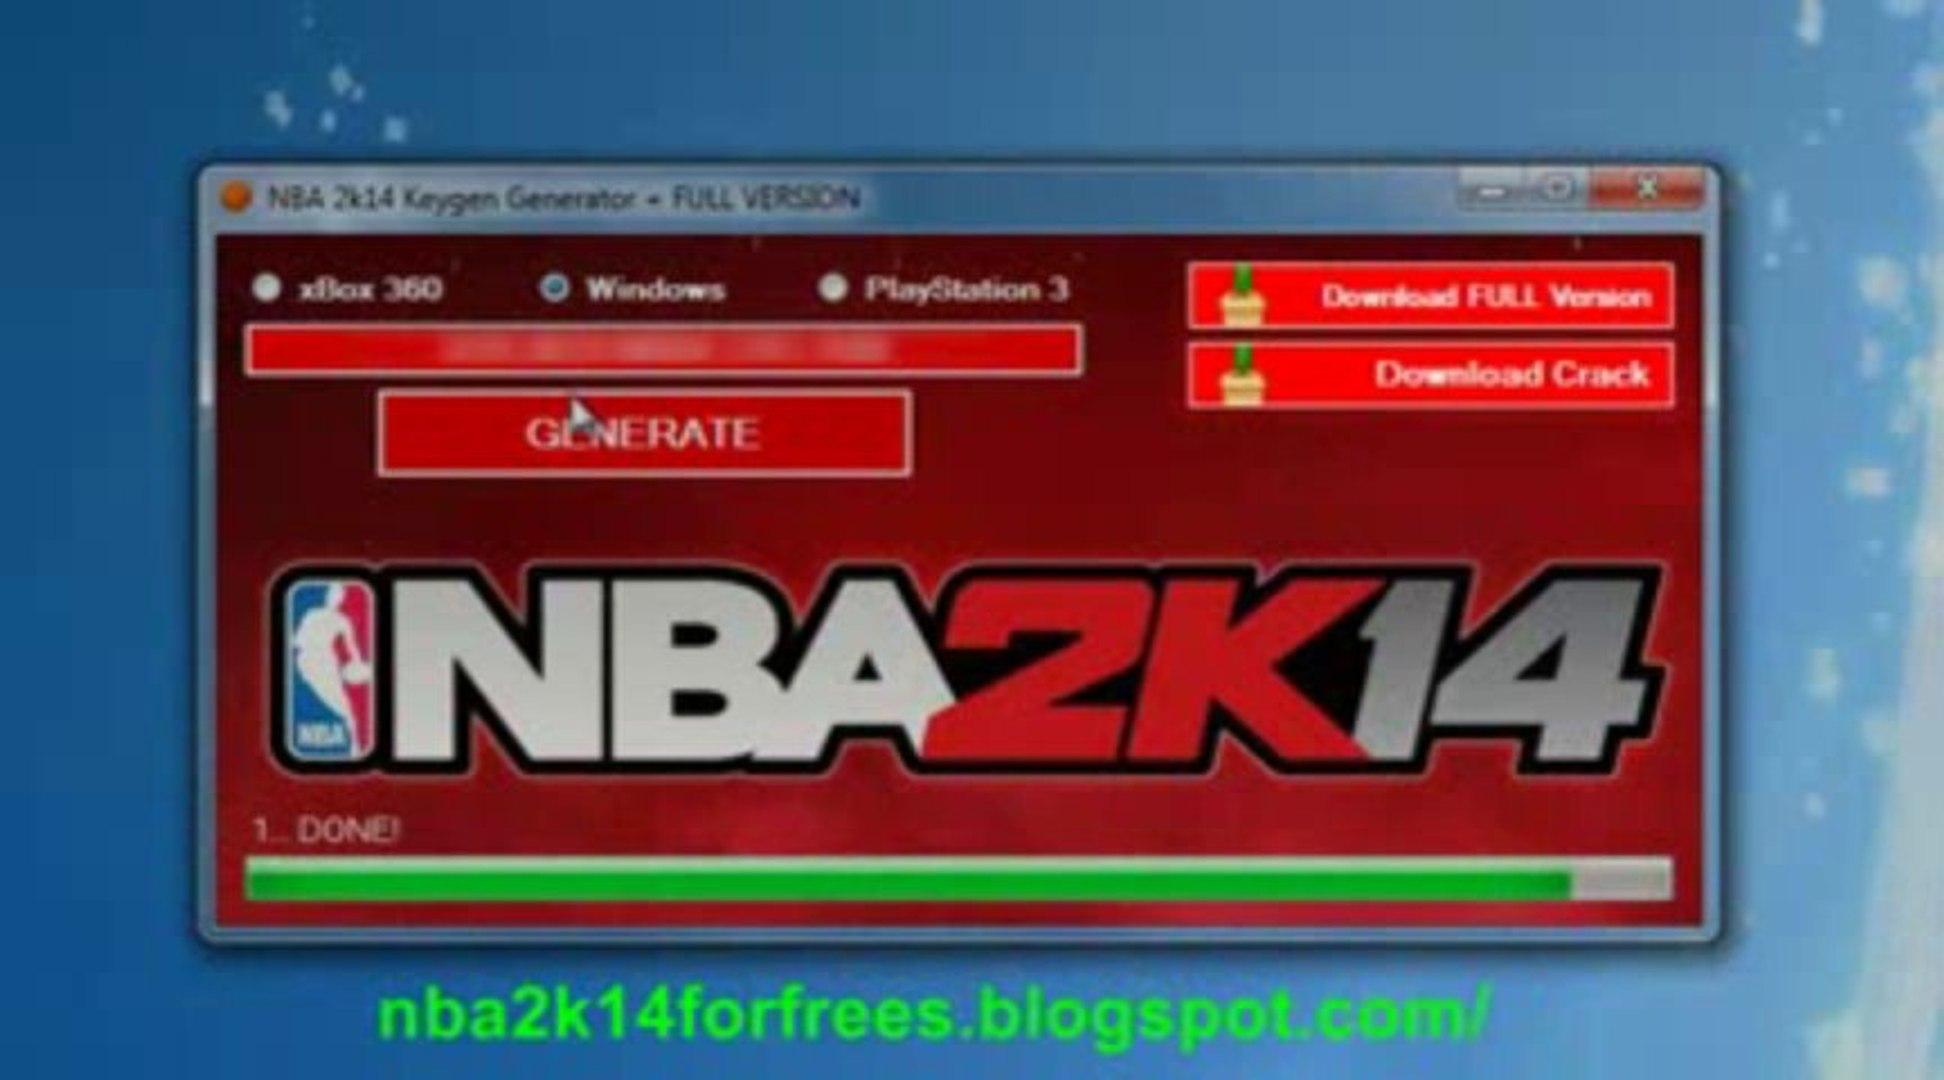 nba 2k14 crack file free download